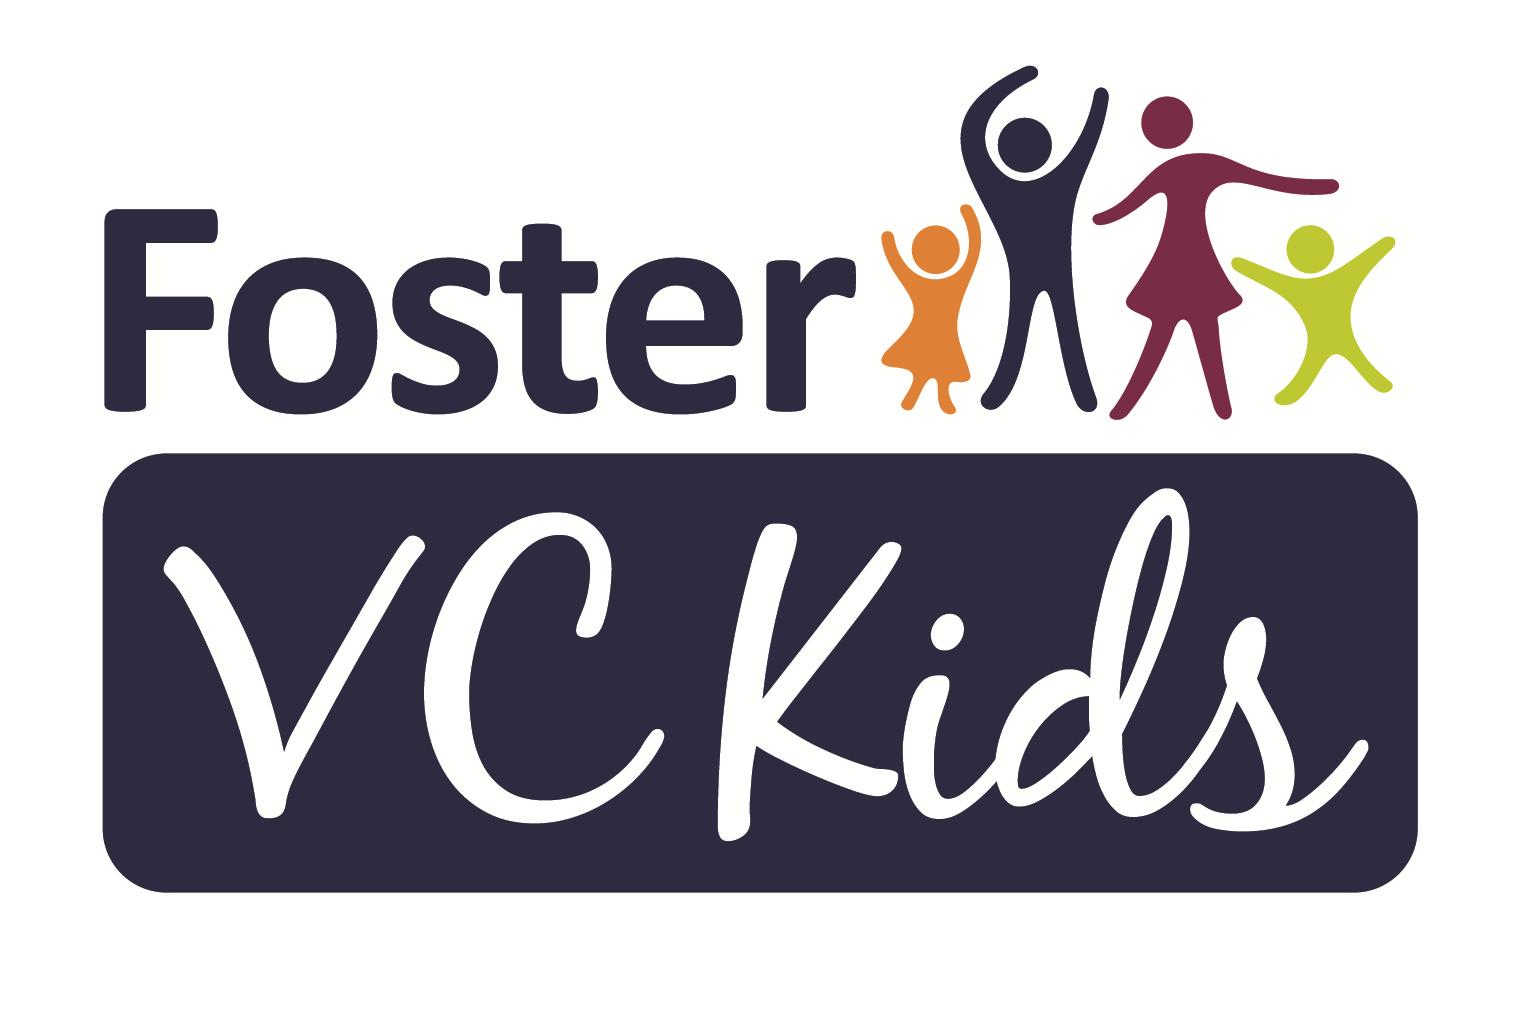 Foster vc kids logo color